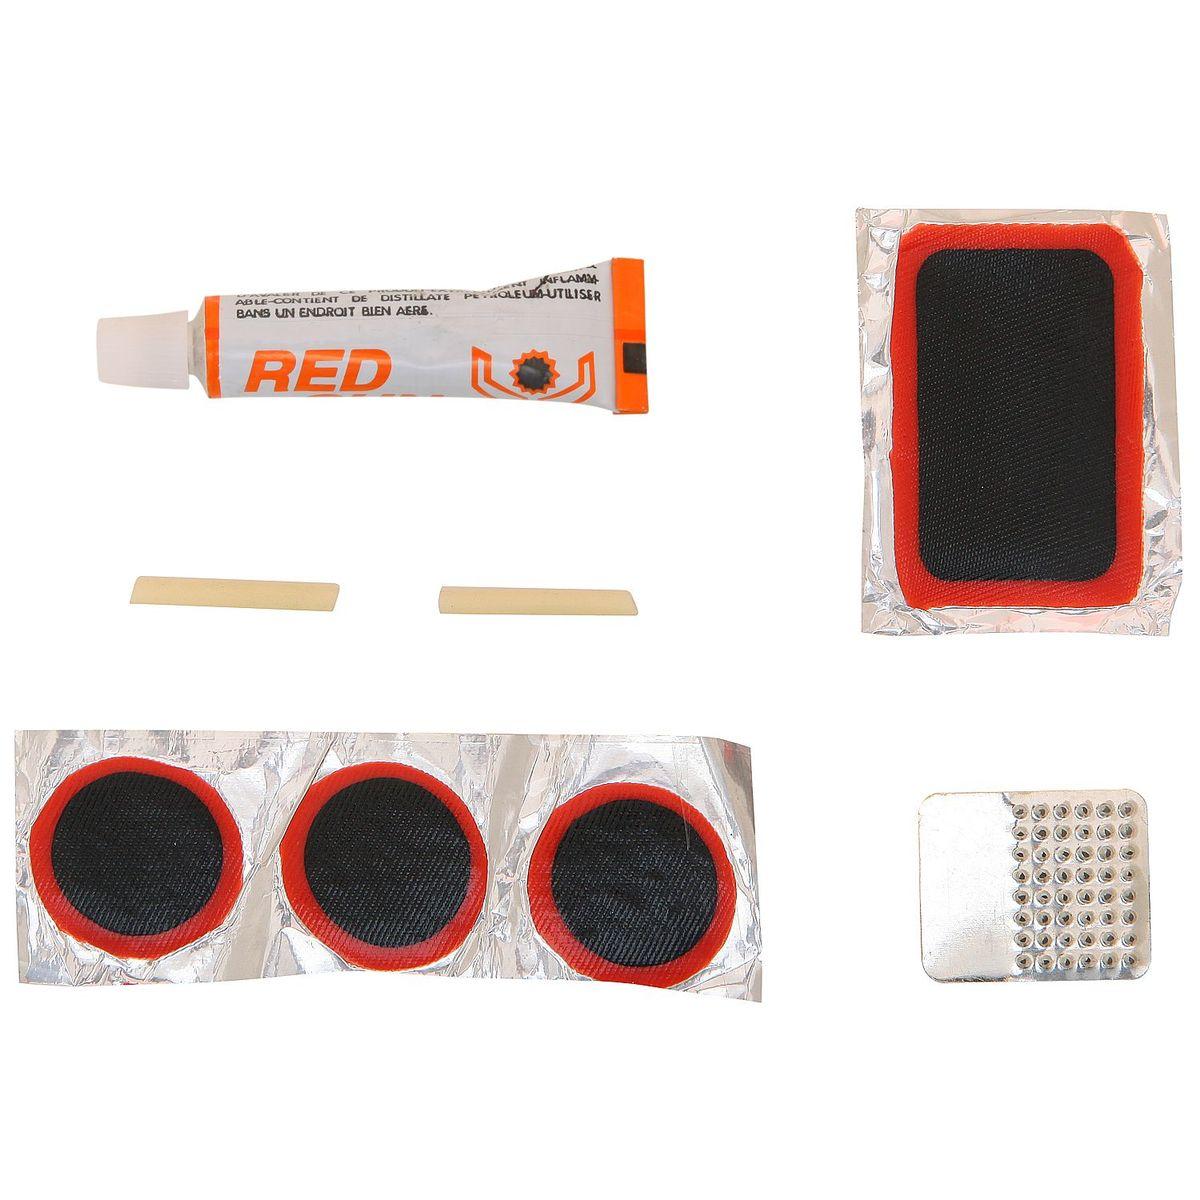 Аптечка для ремонта камер STG T35003. Х33238-5 аккумуляторы для камер smarterra аккумулятор для камер